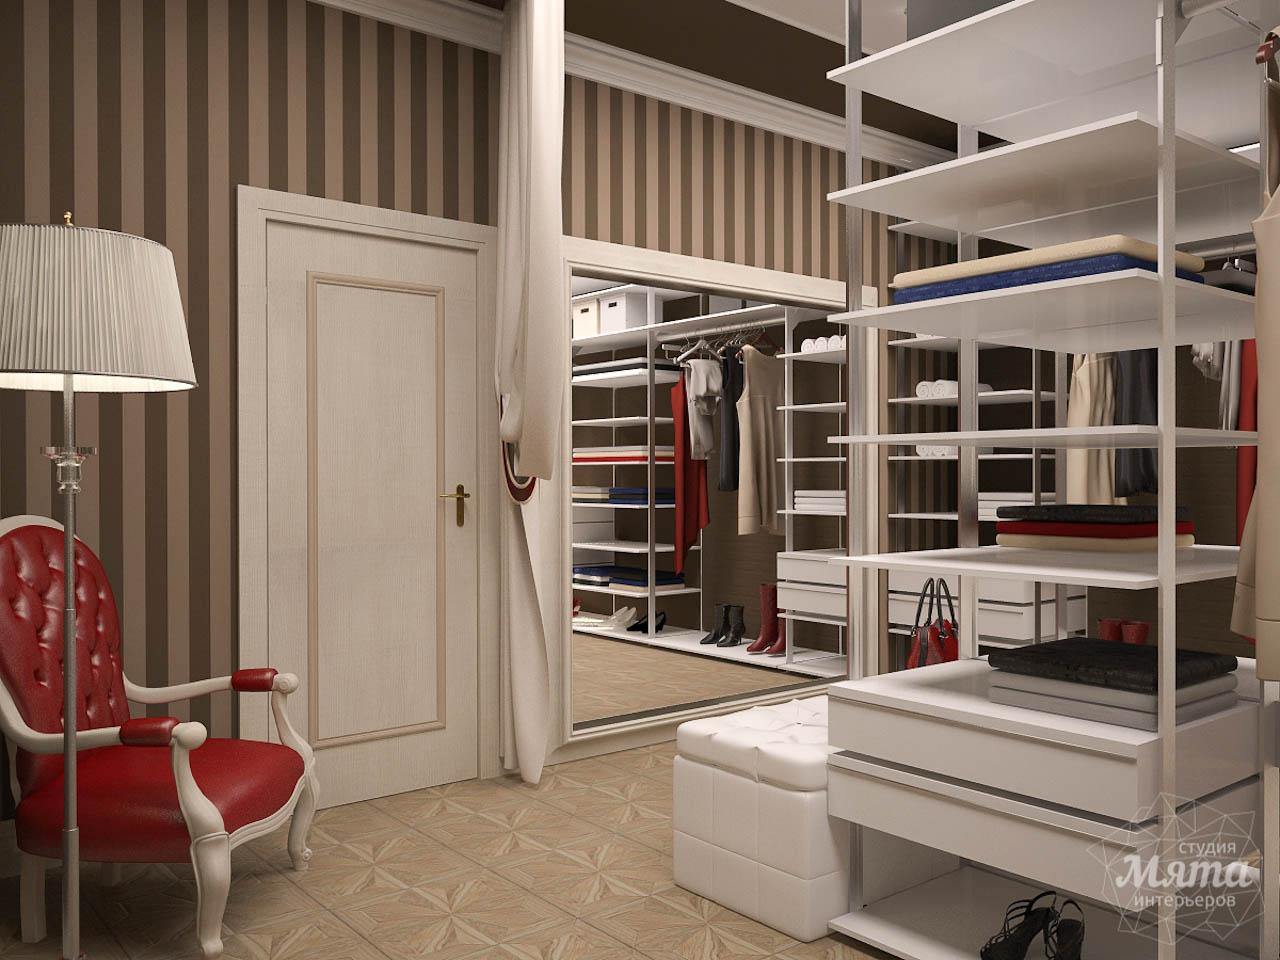 Дизайн интерьера коттеджа по ул. Ландышевая 23 img1407733947